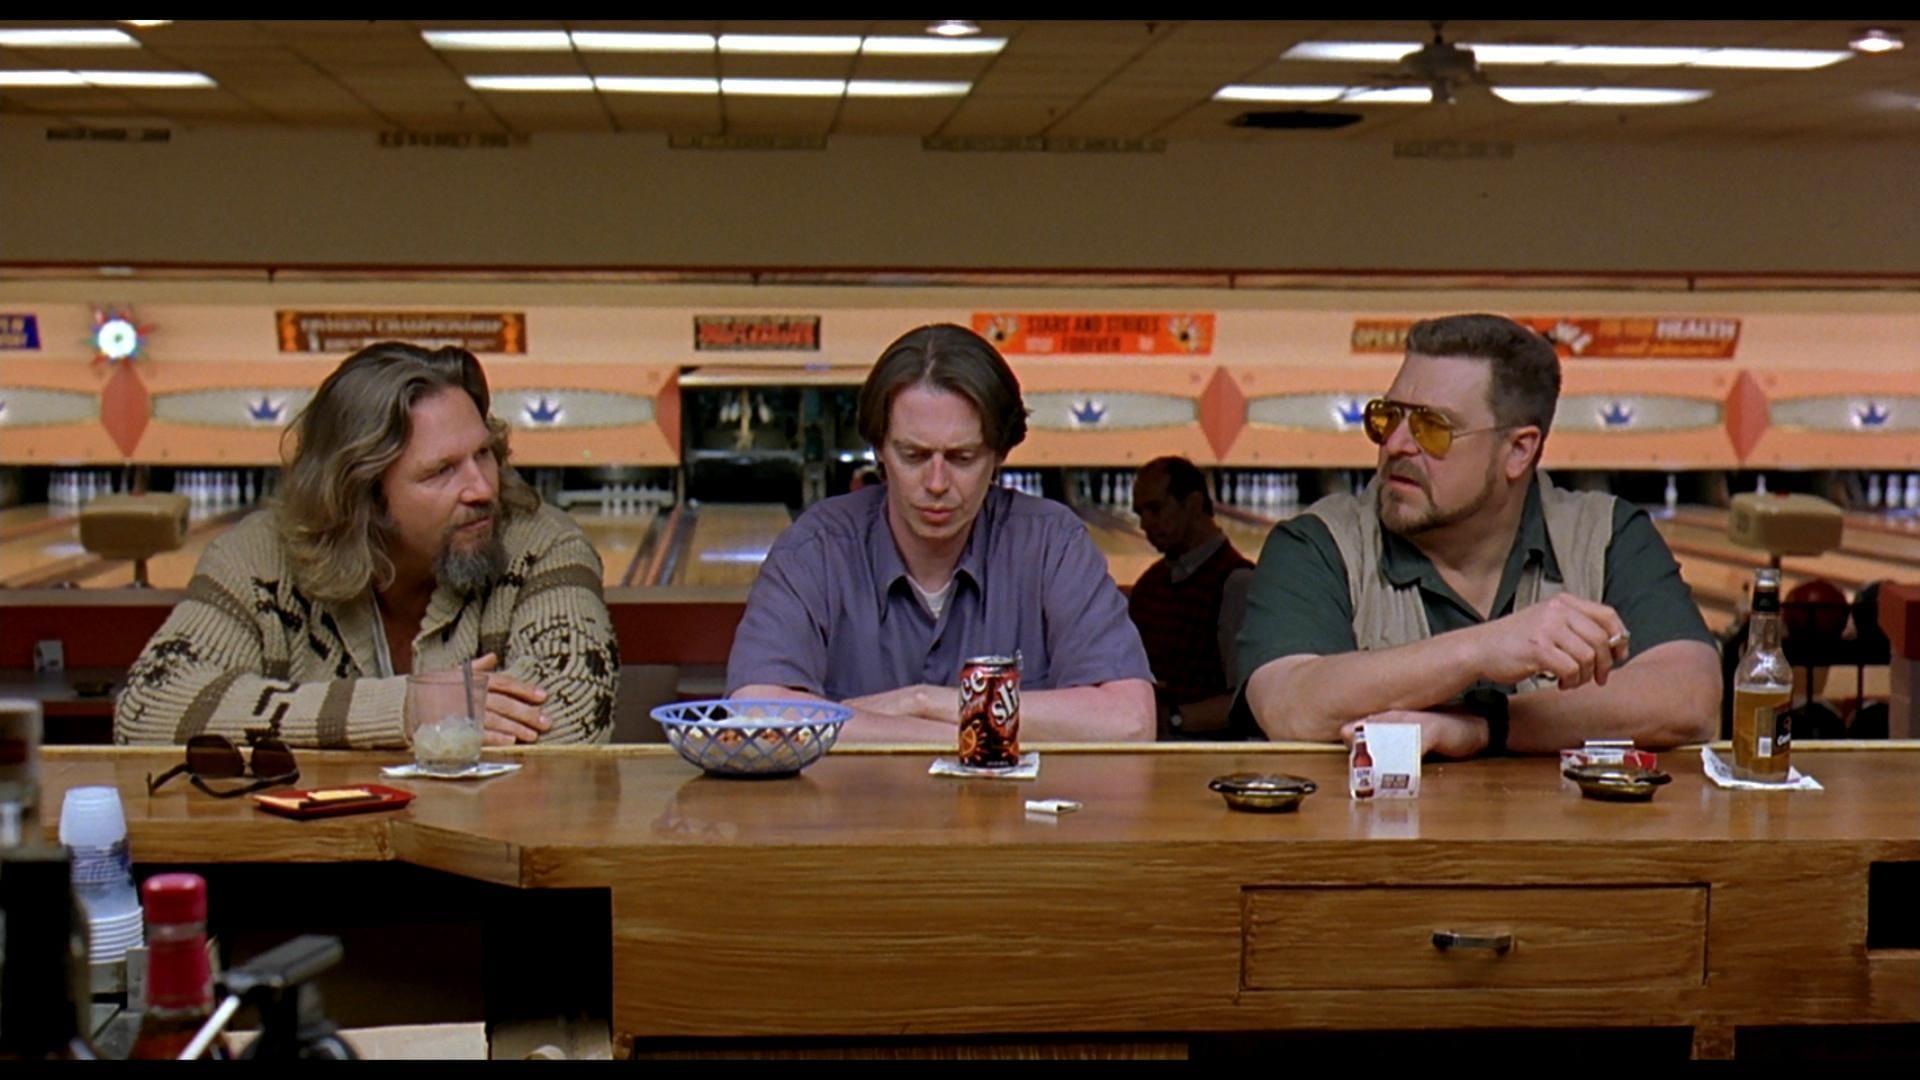 The Big Lebowski movie ending